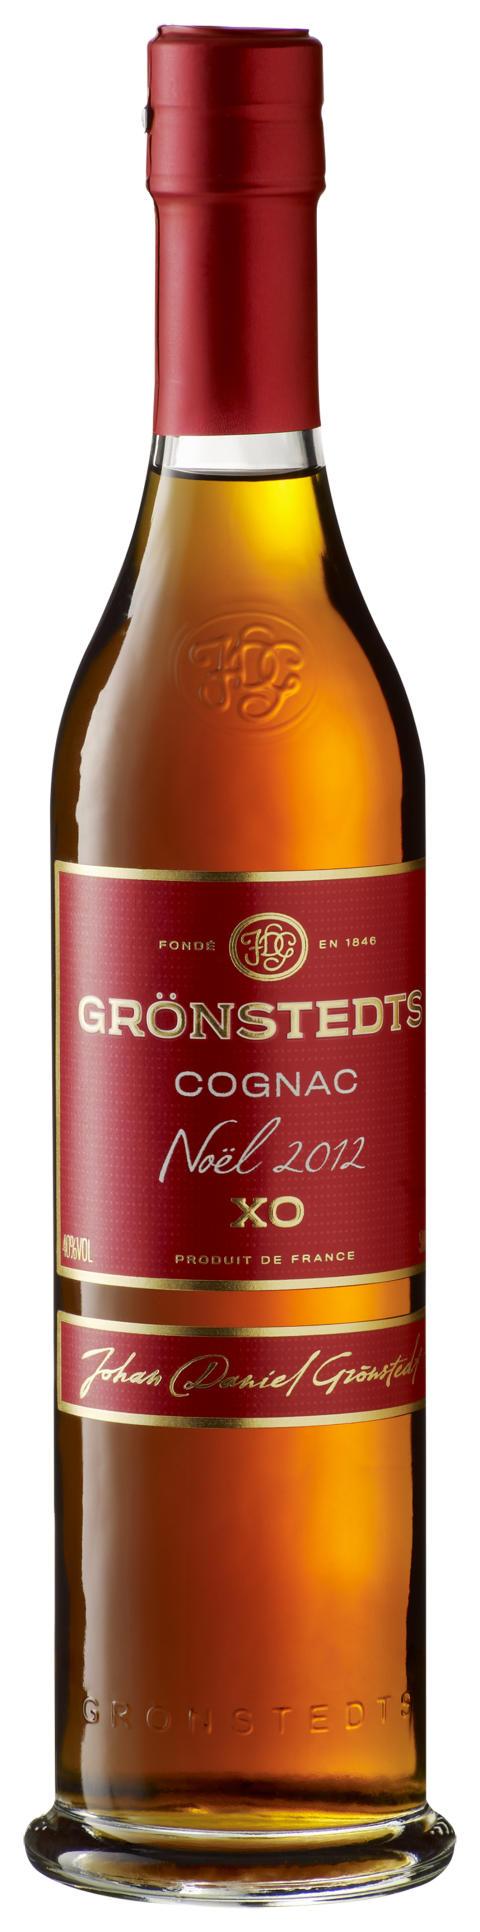 Grönstedts Noël 2012 XO